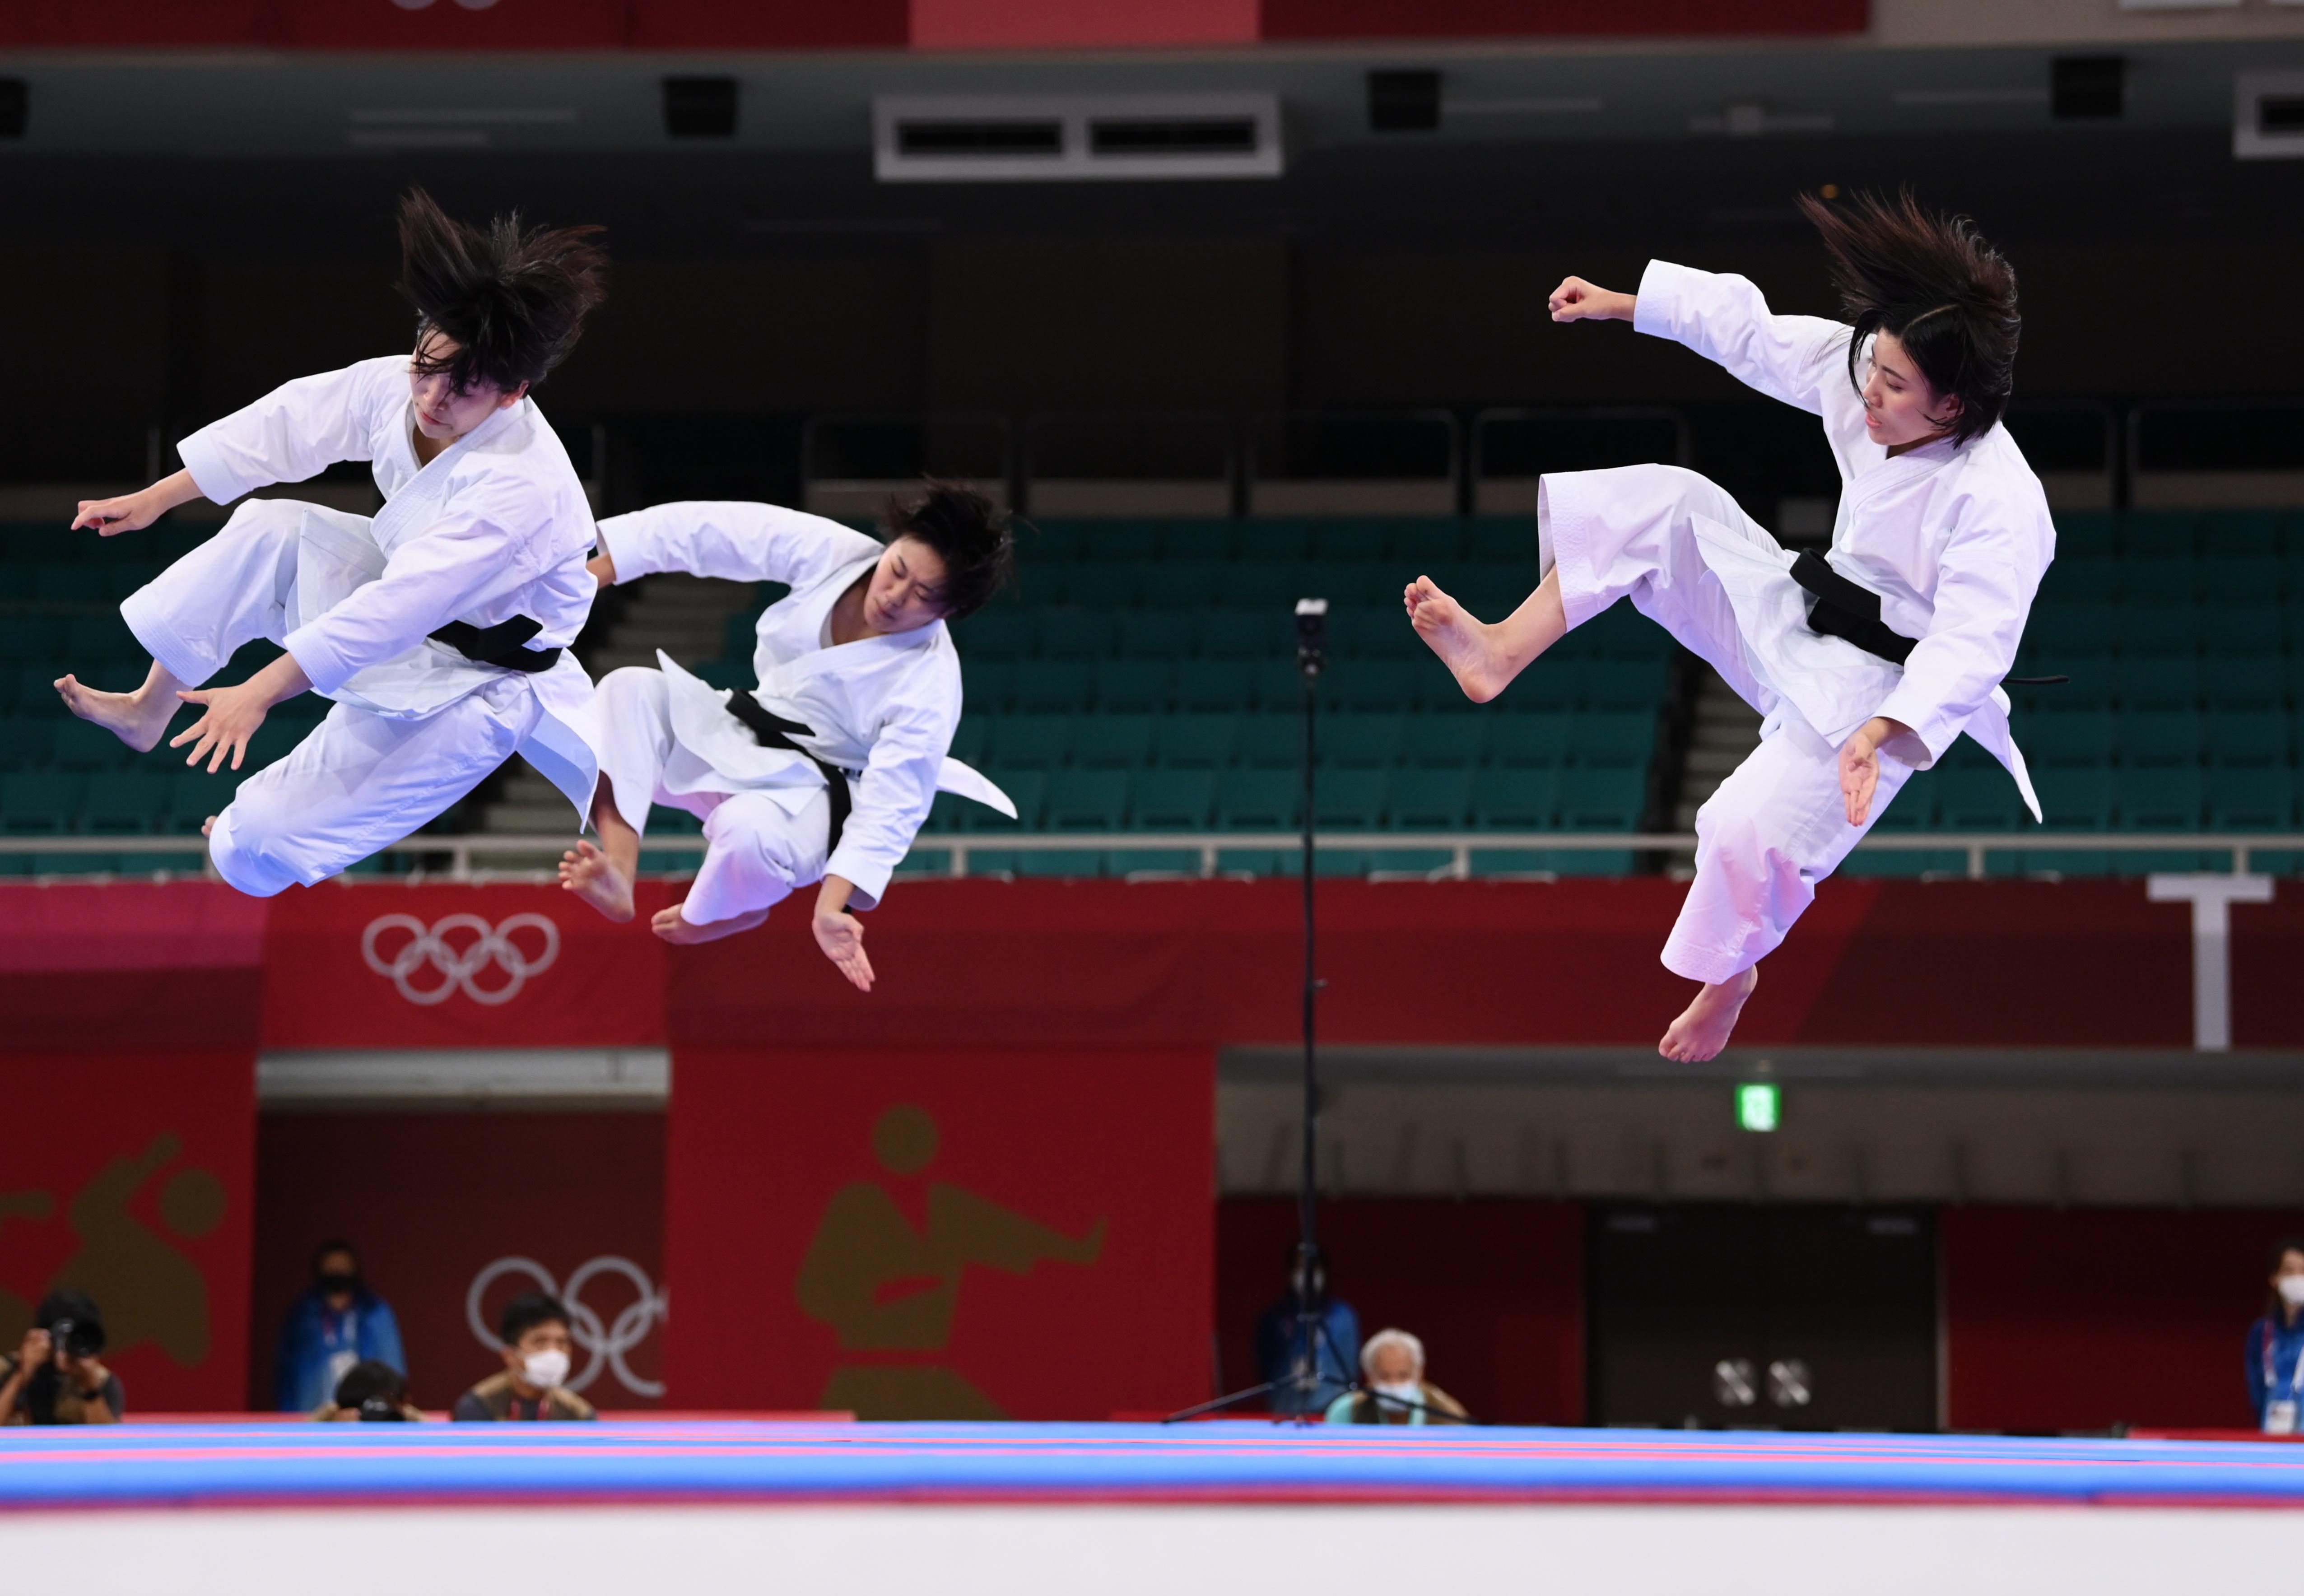 Tokyo 2020 Olympics - Karate - Team Japan's team kata performance - Nippon Budokan, Tokyo, Japan - August 6, 2021. Members of Japan's national team perform. REUTERS/Annegret Hilse - SP1EH860A8JPX